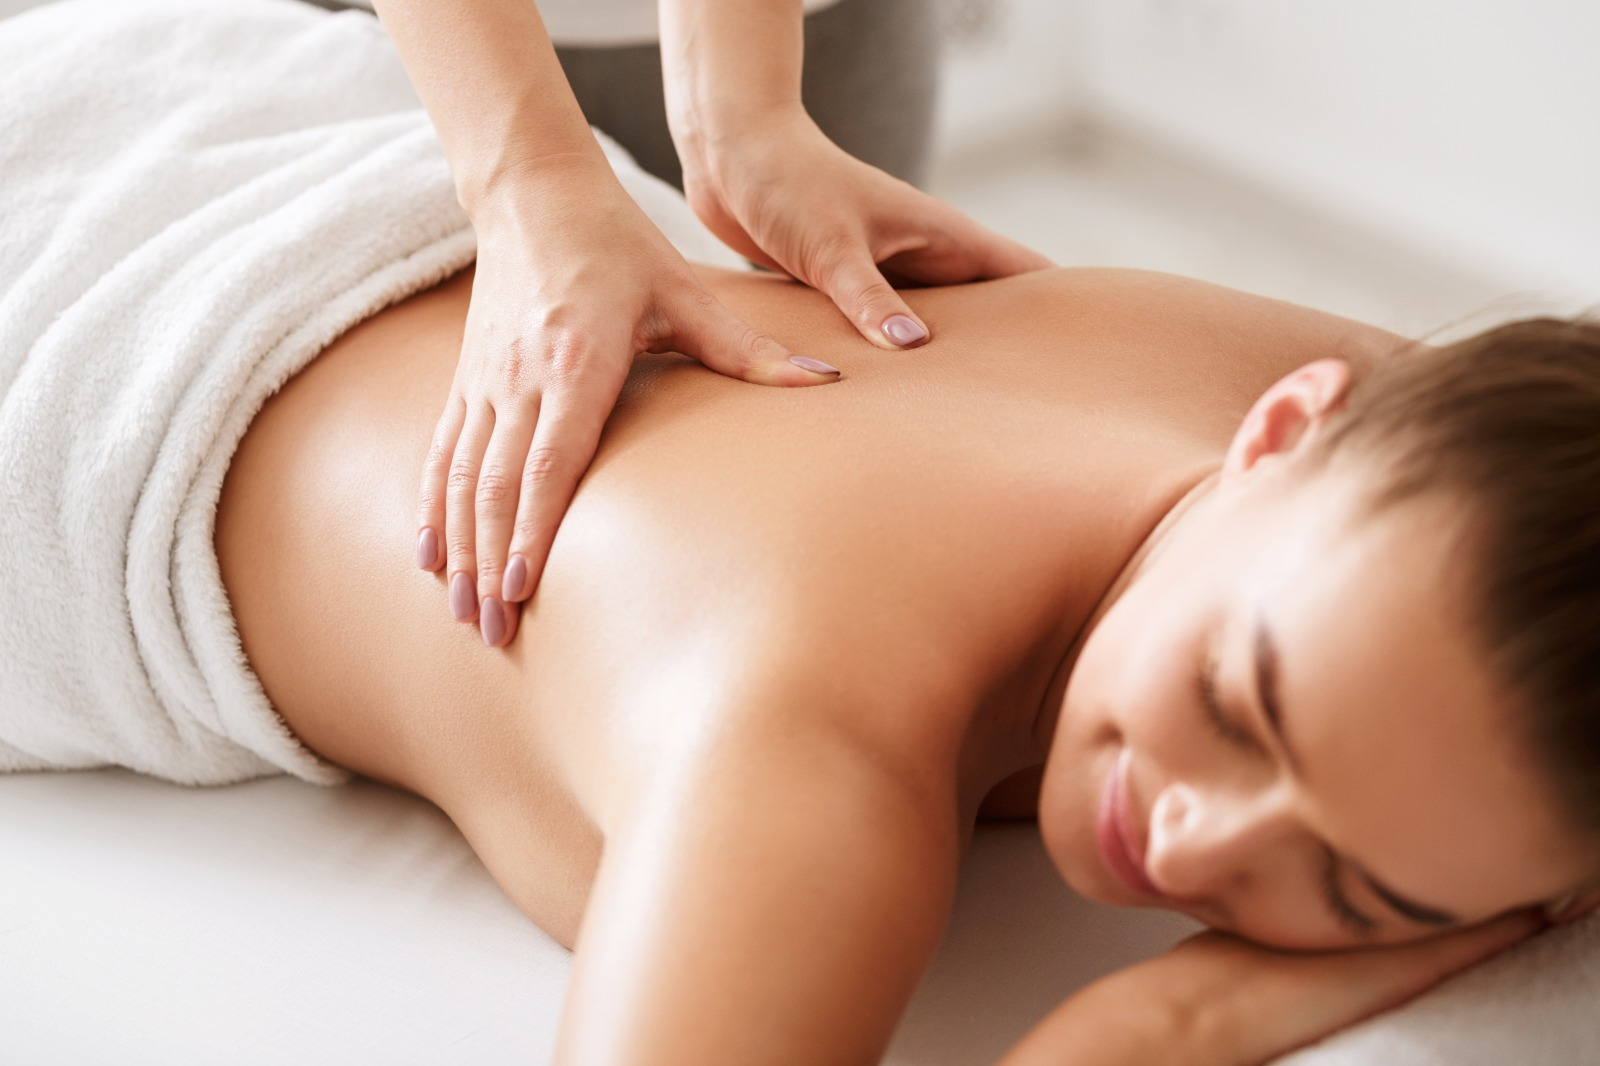 find a female massage therapist near me